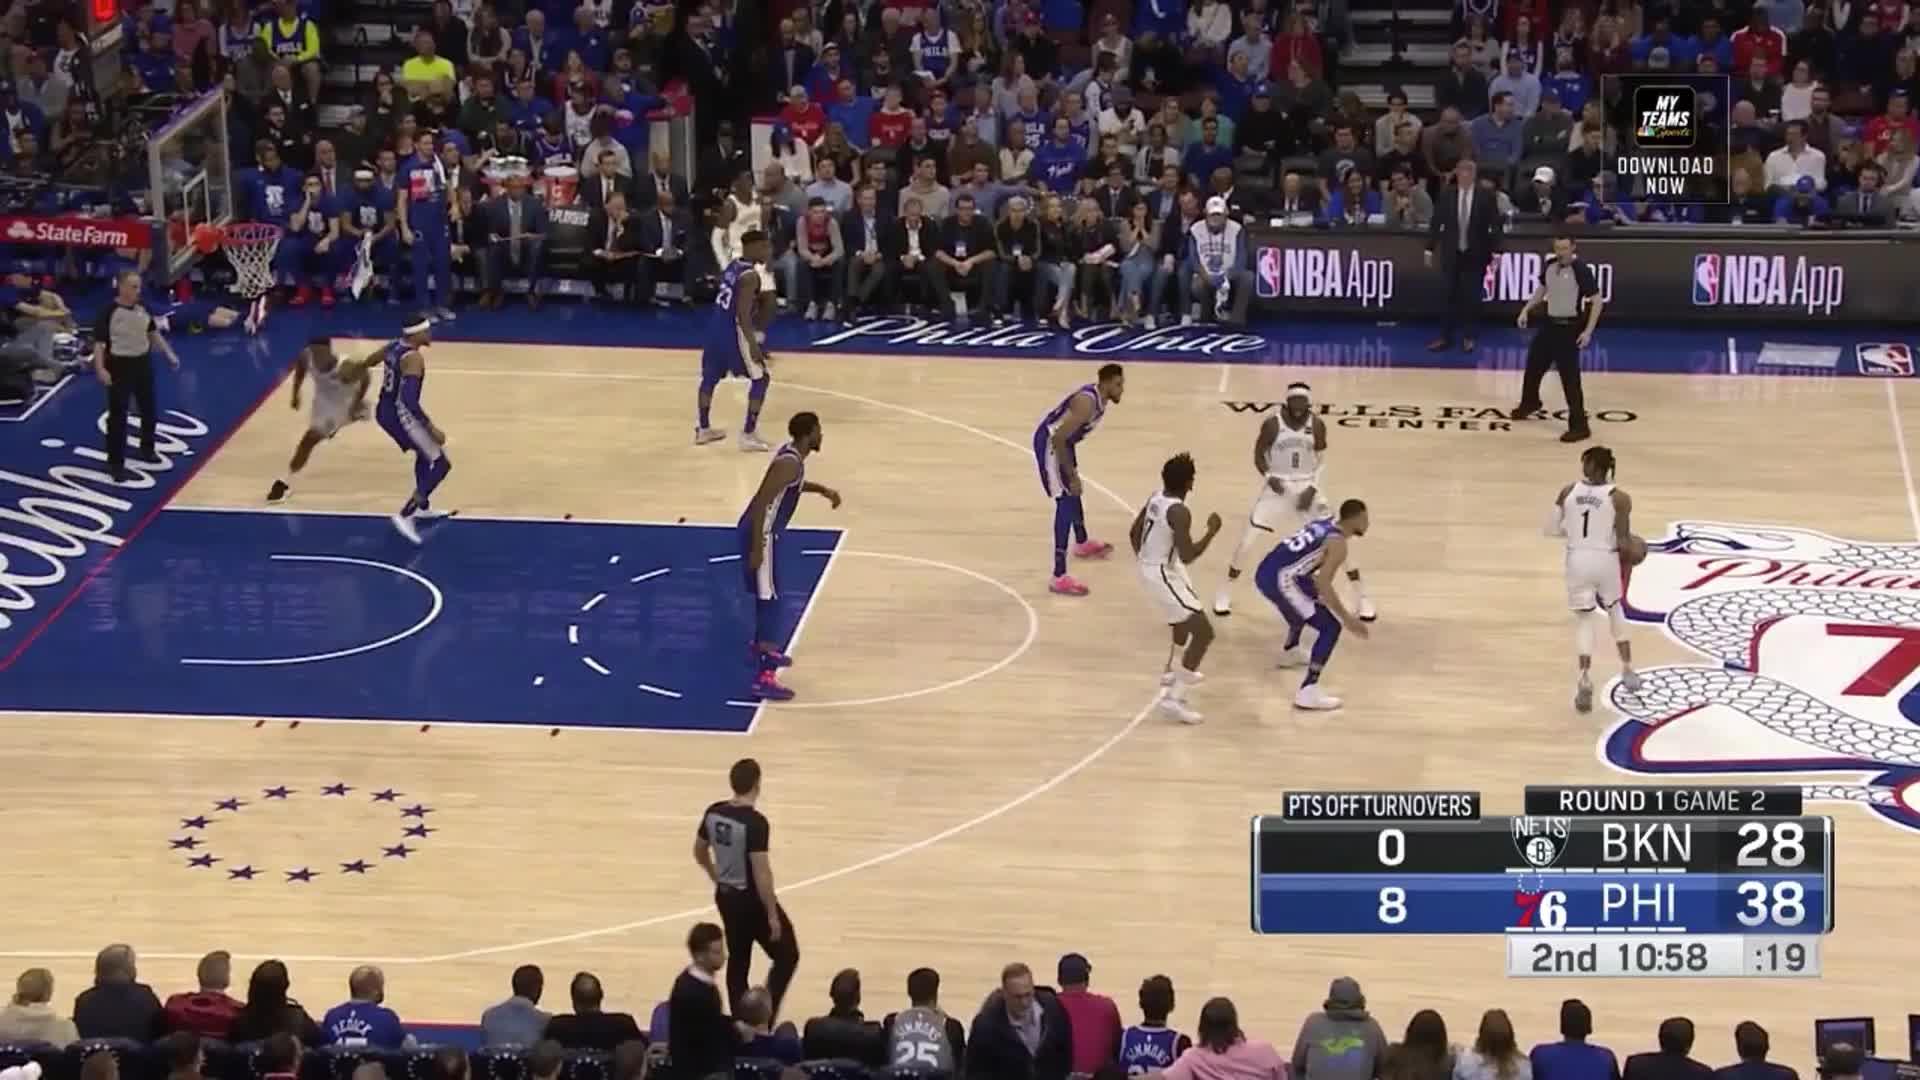 Brooklyn Nets, Jonah Bolden, NBA, Philadelphia 76ers, basketball, Jonah Bolden Nets 3 Game 2 GIFs